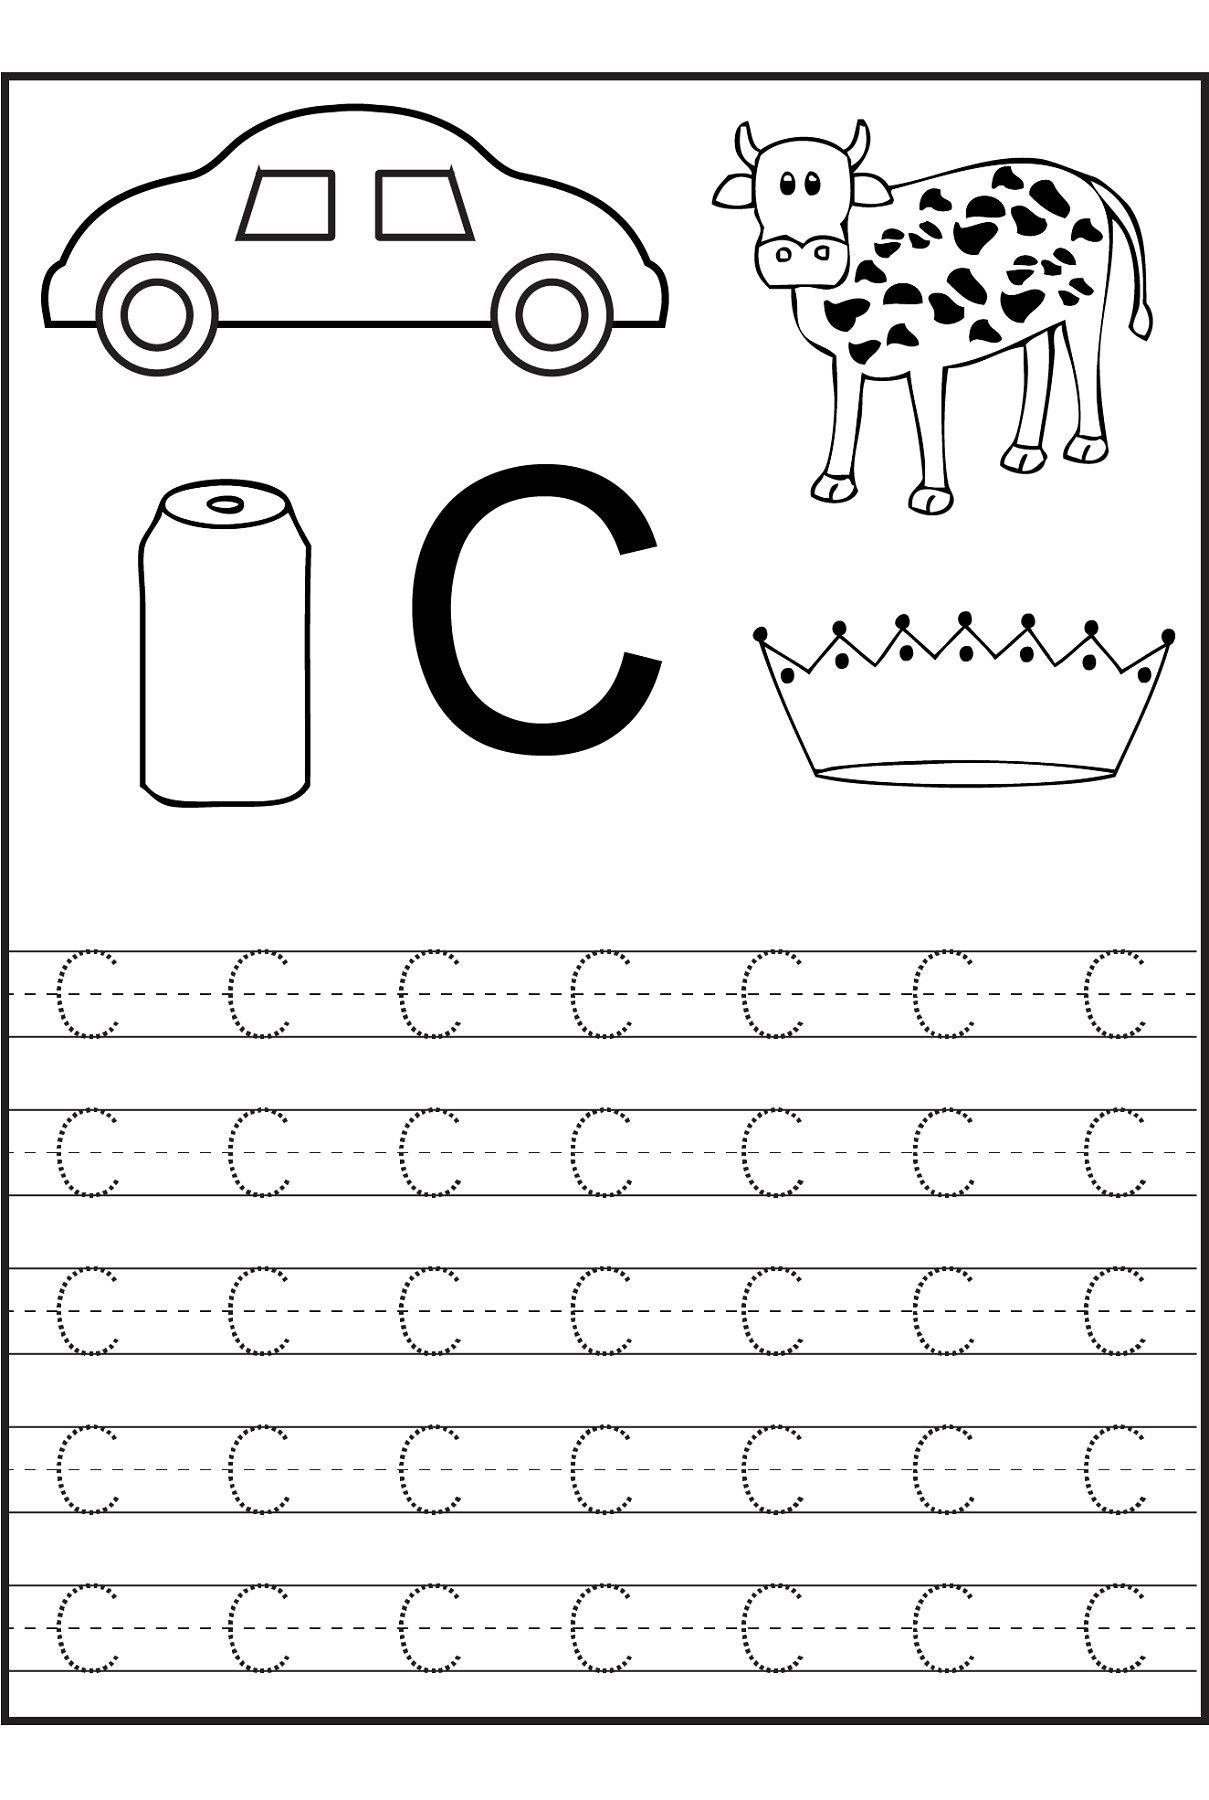 7 Letter C Writing Practice Worksheet In